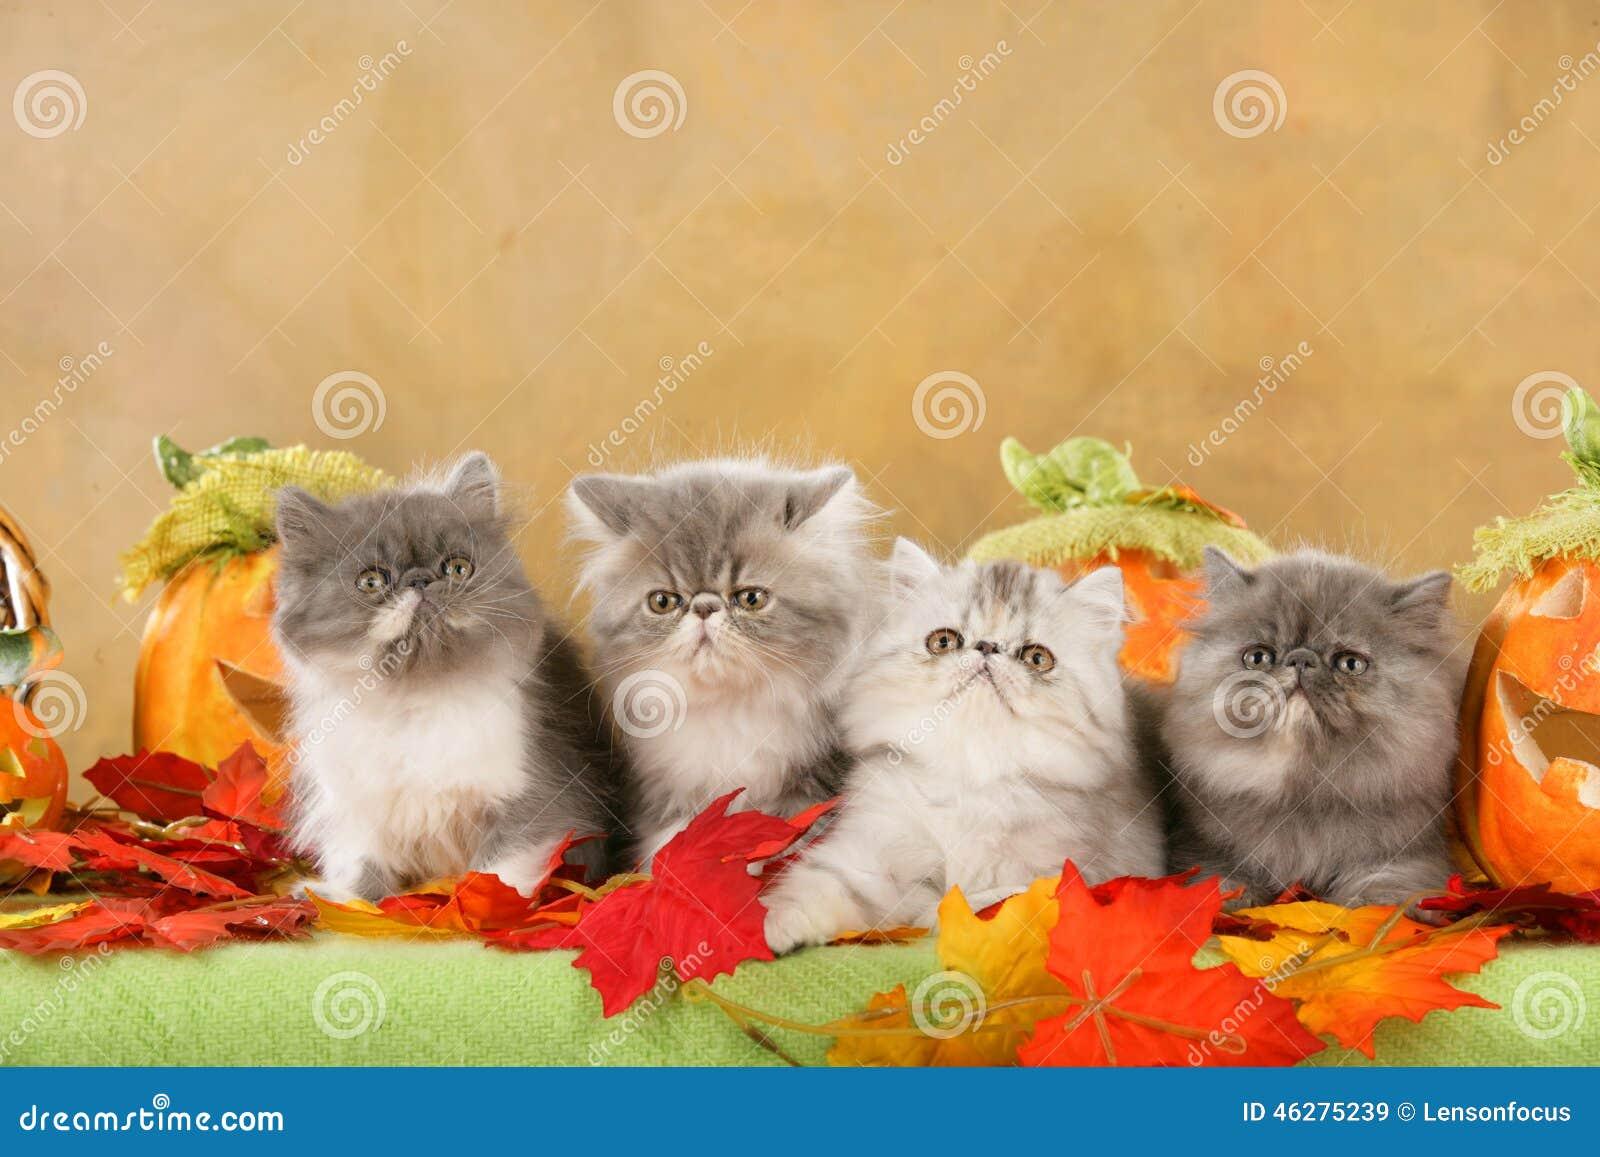 cat lynx autumn foliage - photo #31